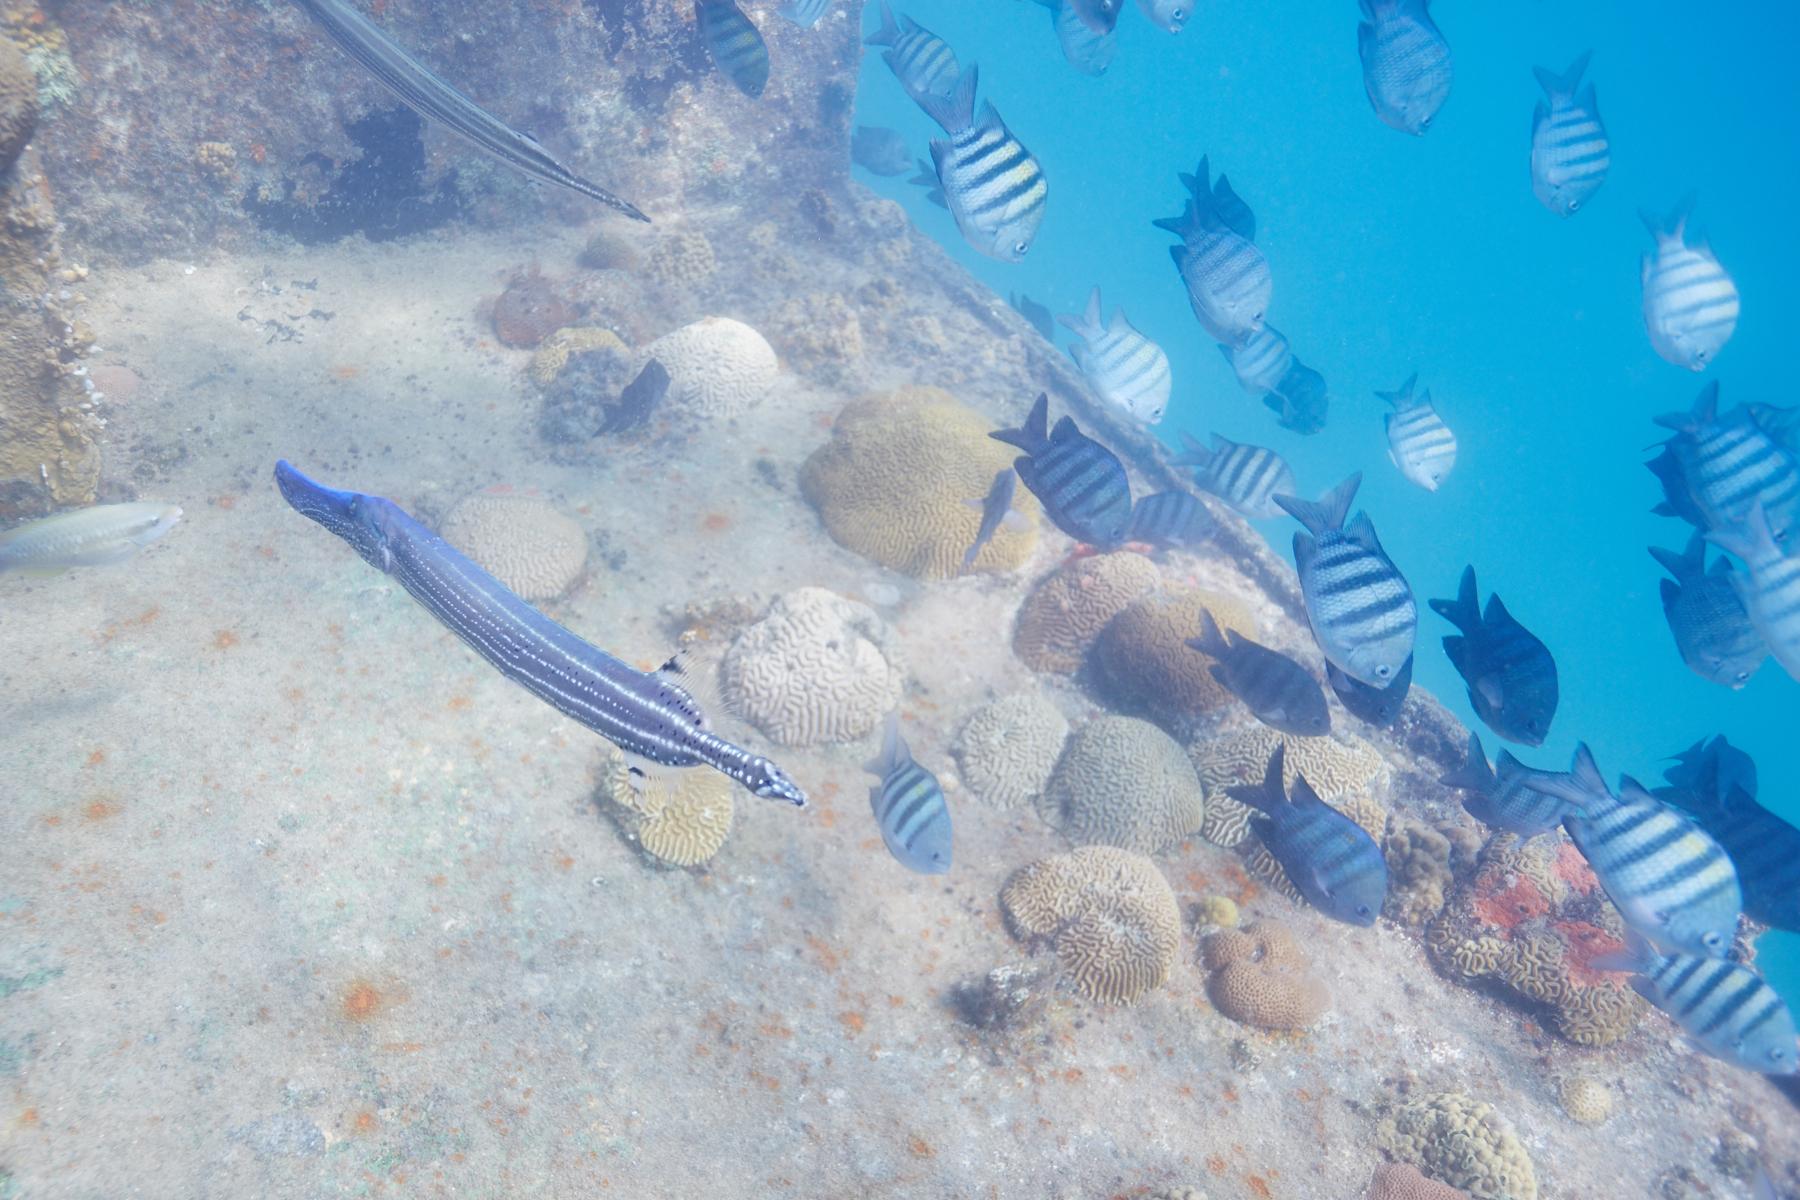 Trumpetfish & Sargent Major Damselfishes